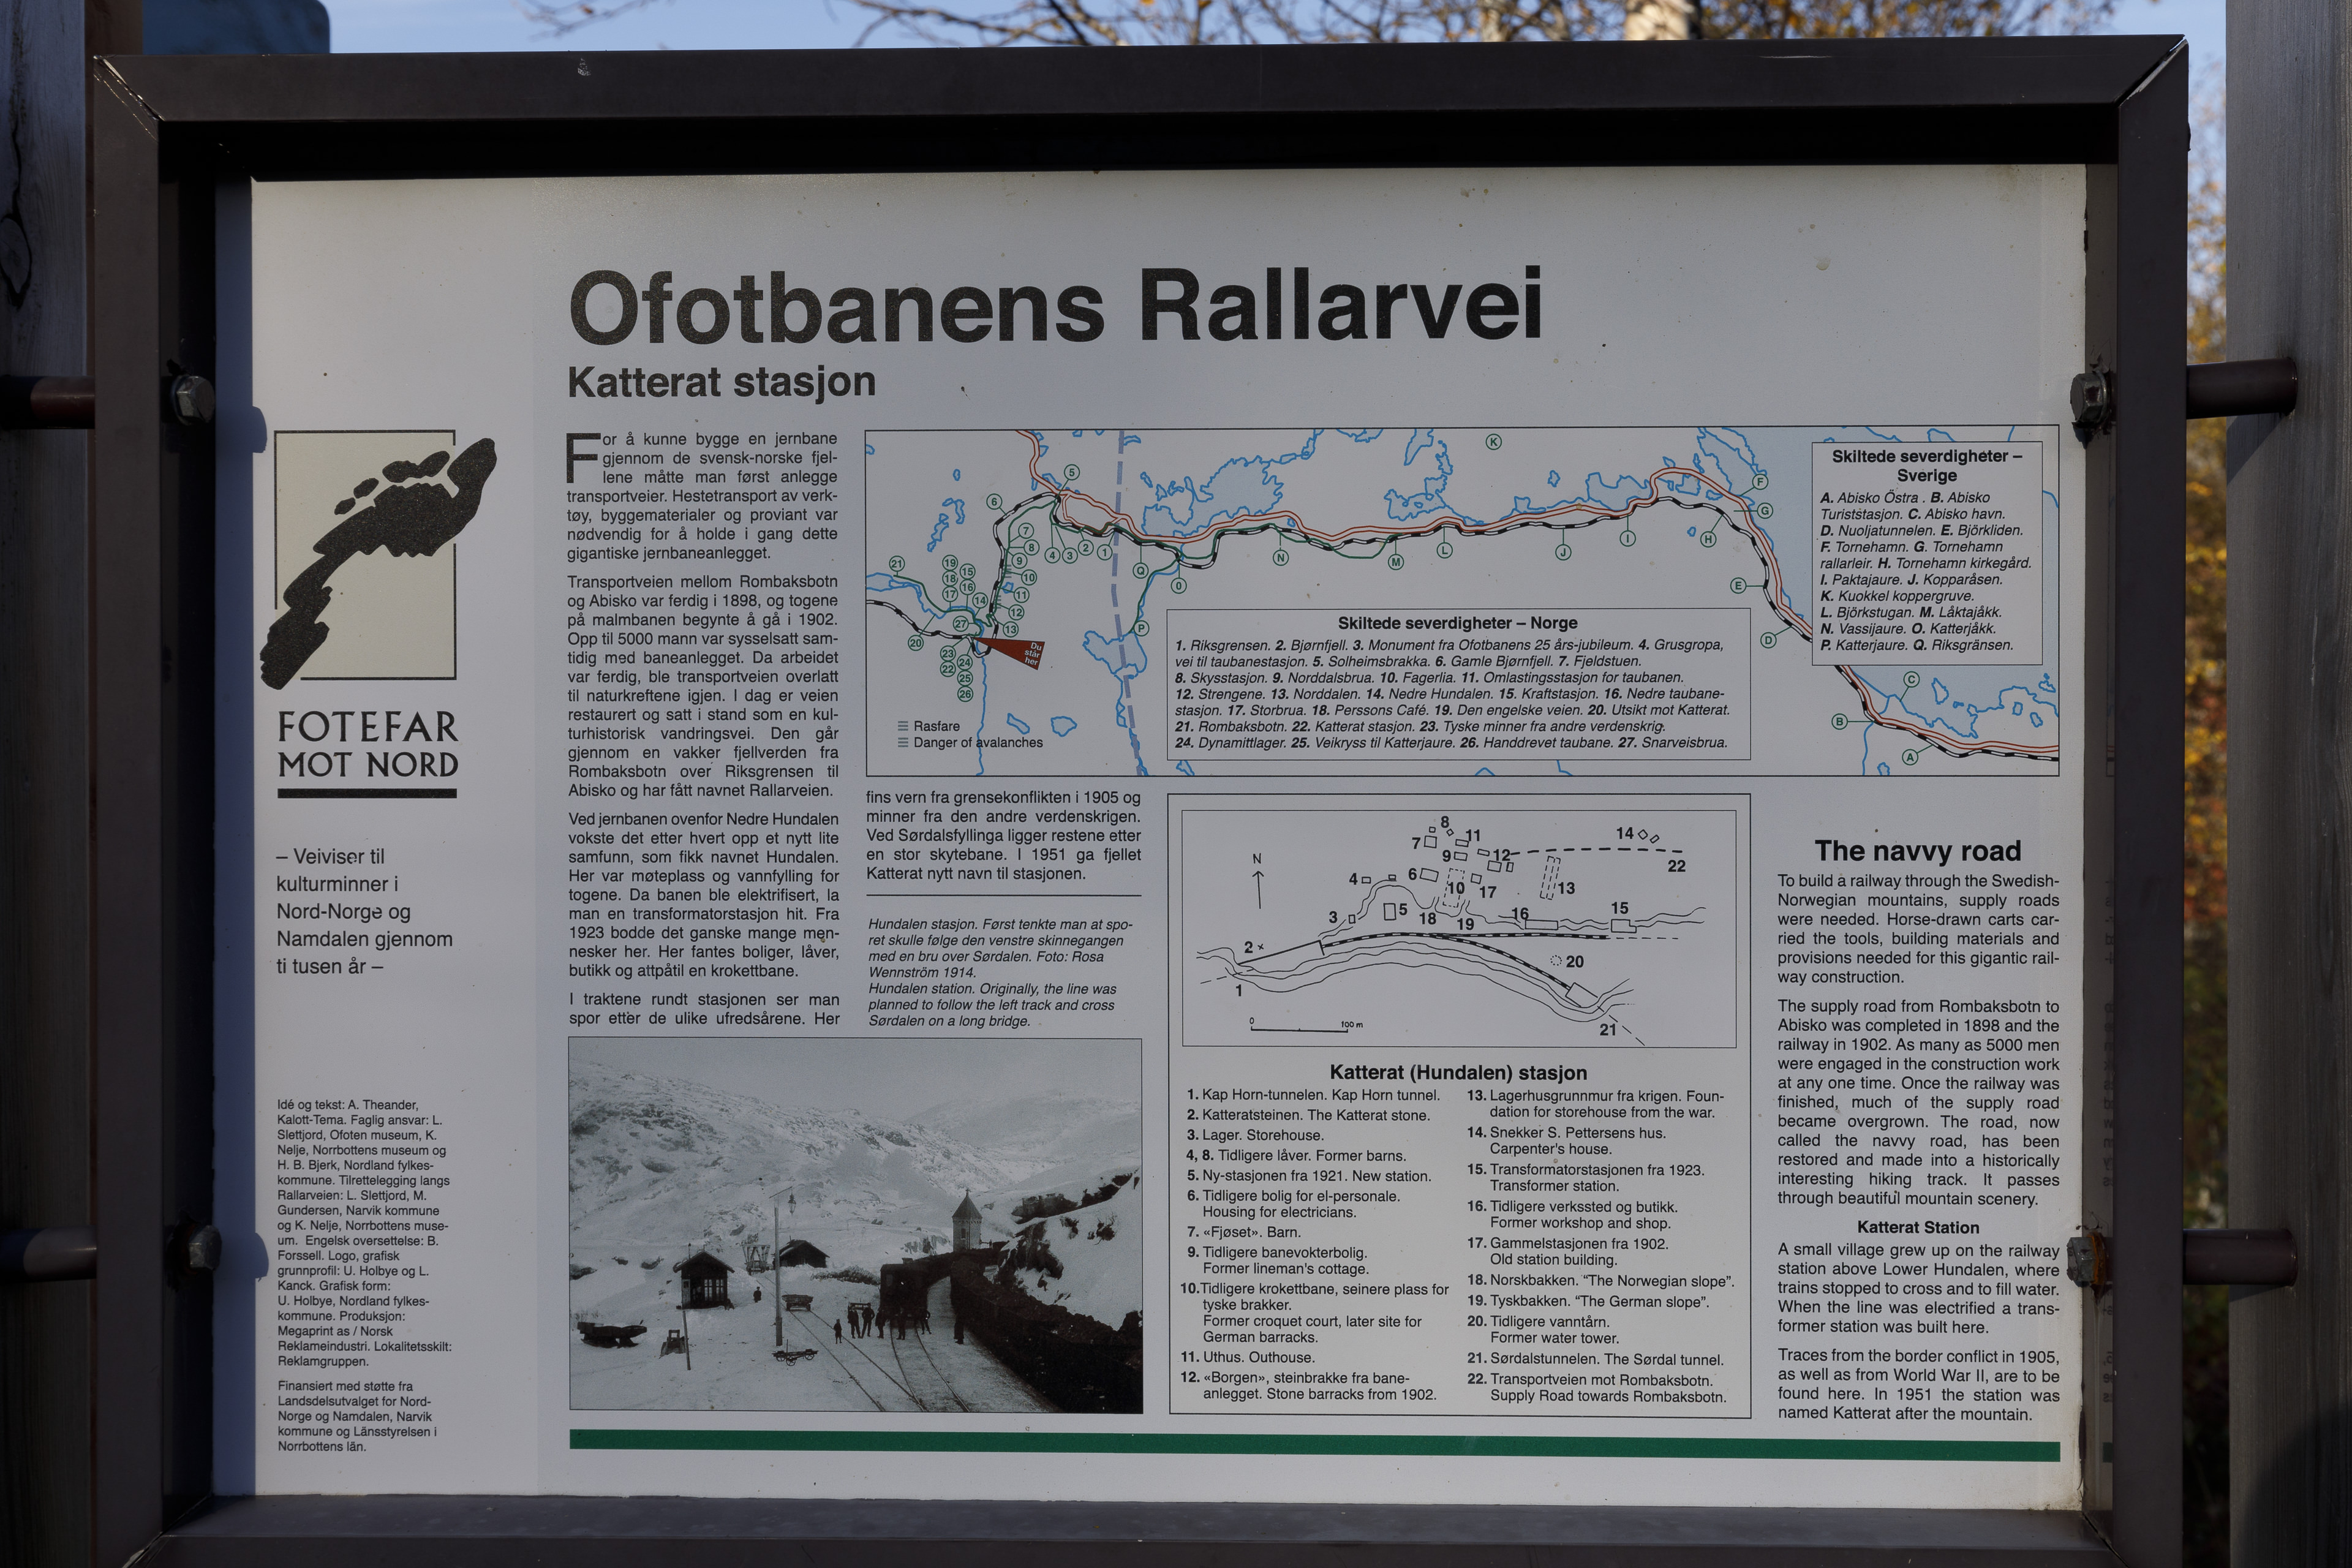 Rallarvei (Ofotbanen),©Markus Proske—Canon EOS 5D Mark IV, EF16-35mm f/4L IS USM, 35mm, 1/160s, Blende 11, ISO 100